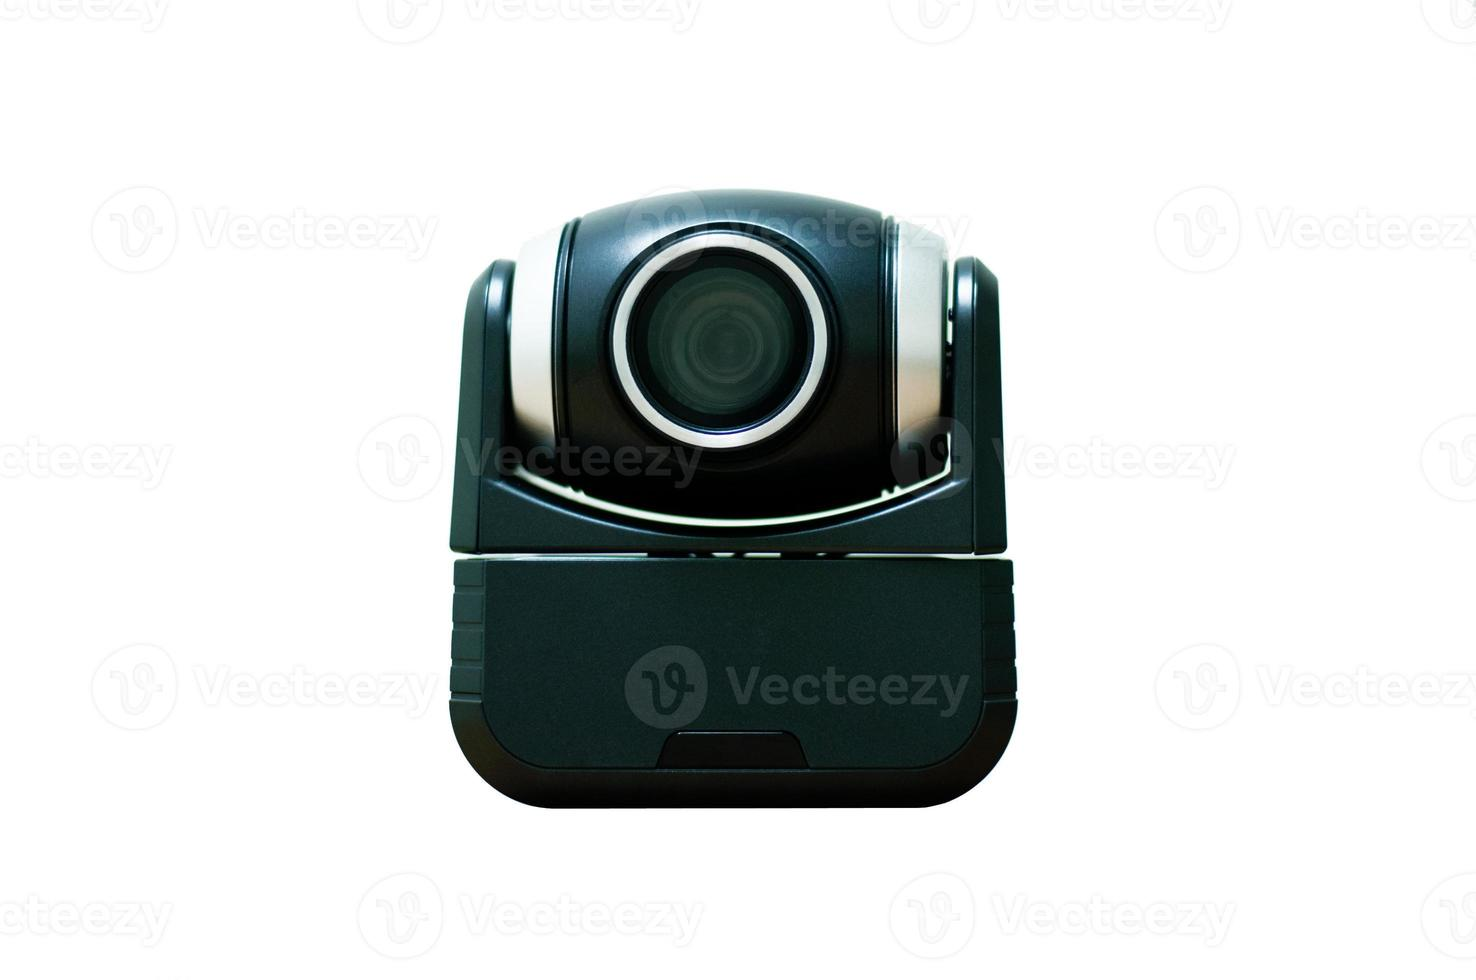 Videokonferenzkamera foto